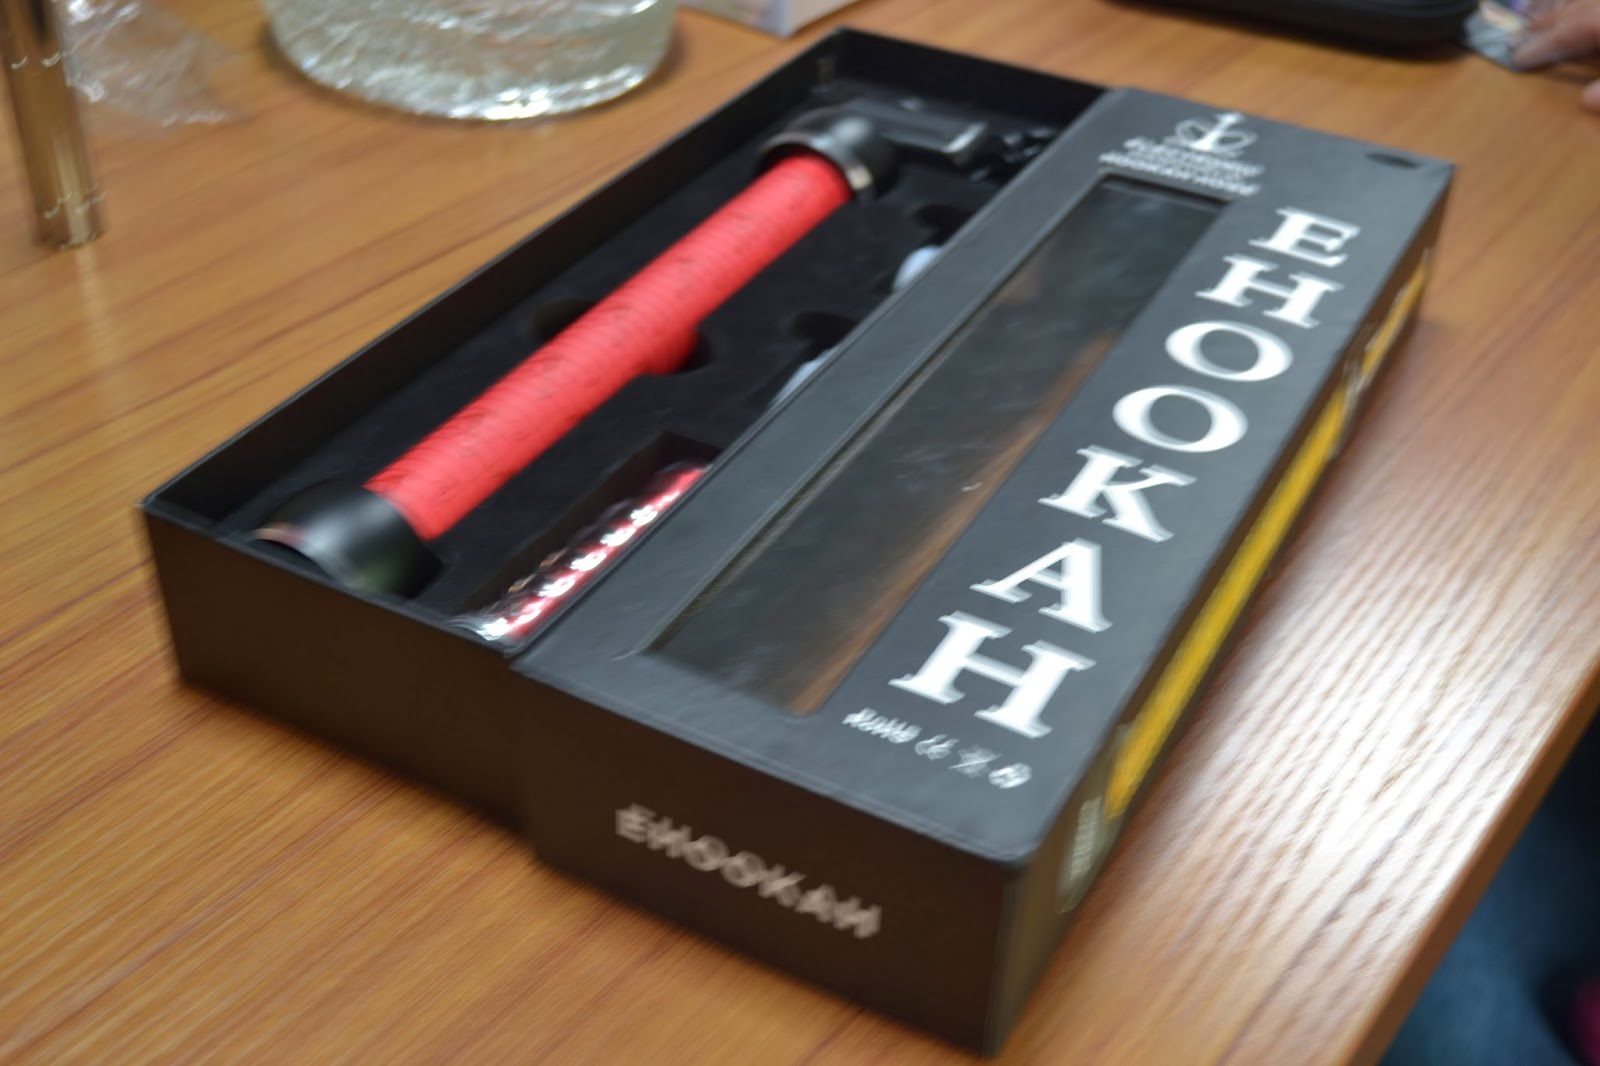 pro factory king ciger: starbuzz e hose,excellent enjoy hookah!